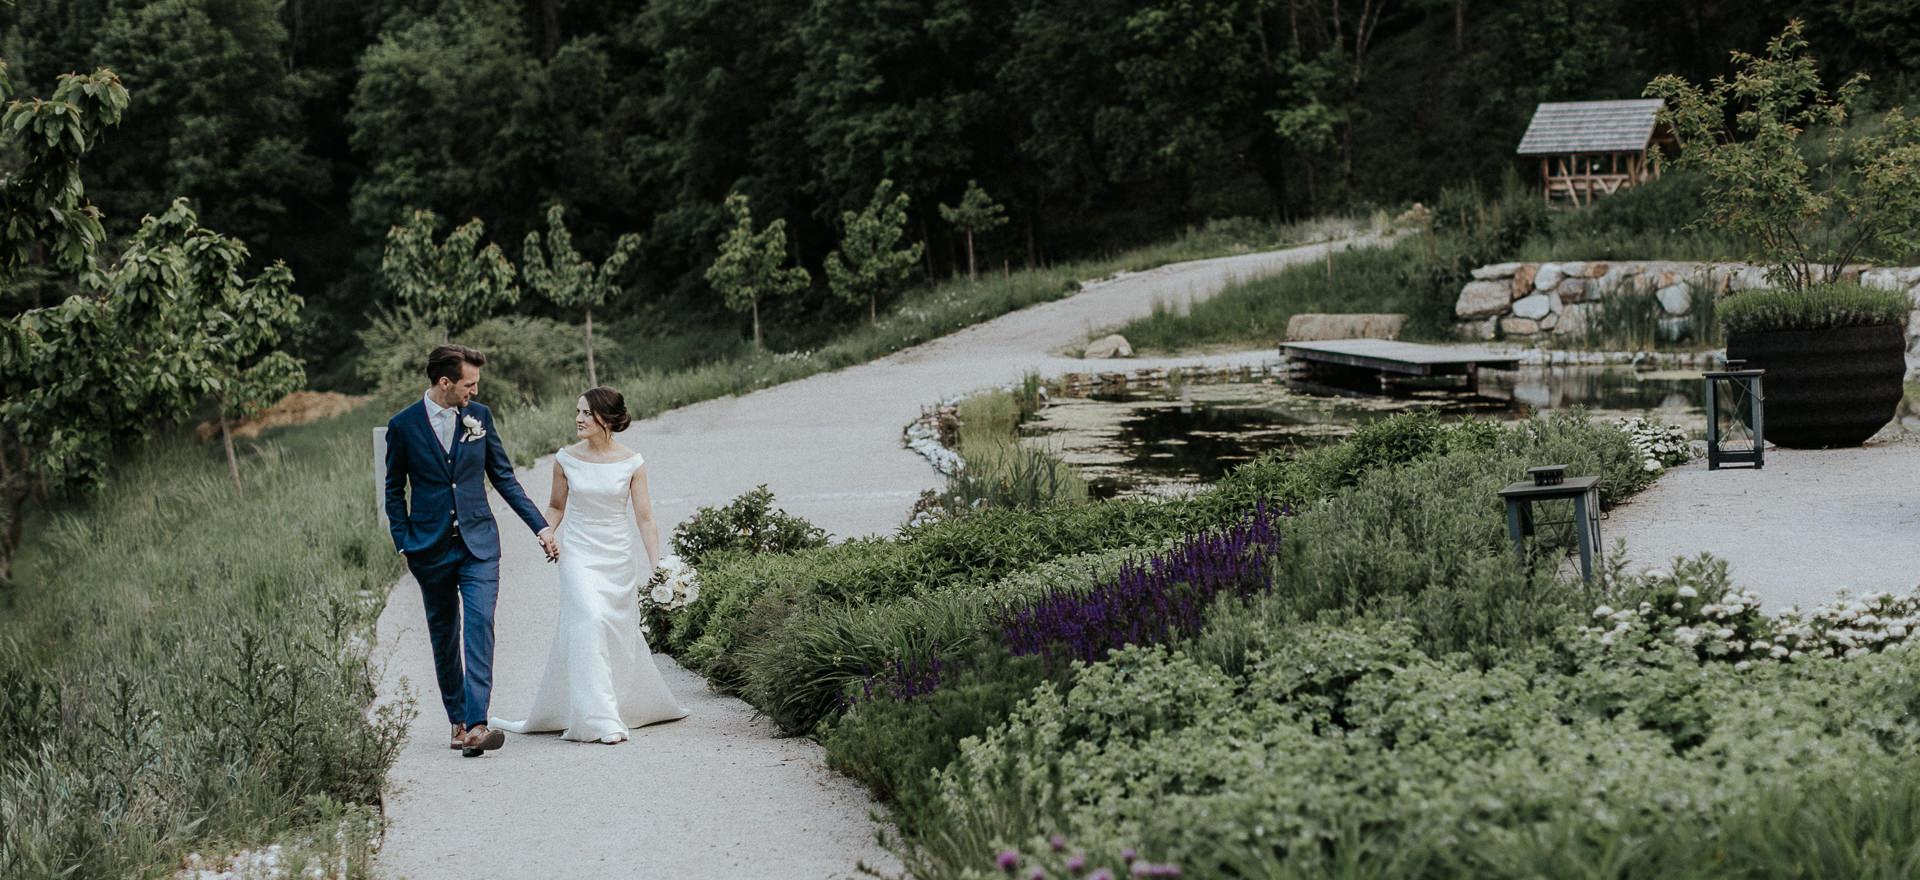 Hochzeitsfotograf Wien - Paarshooting